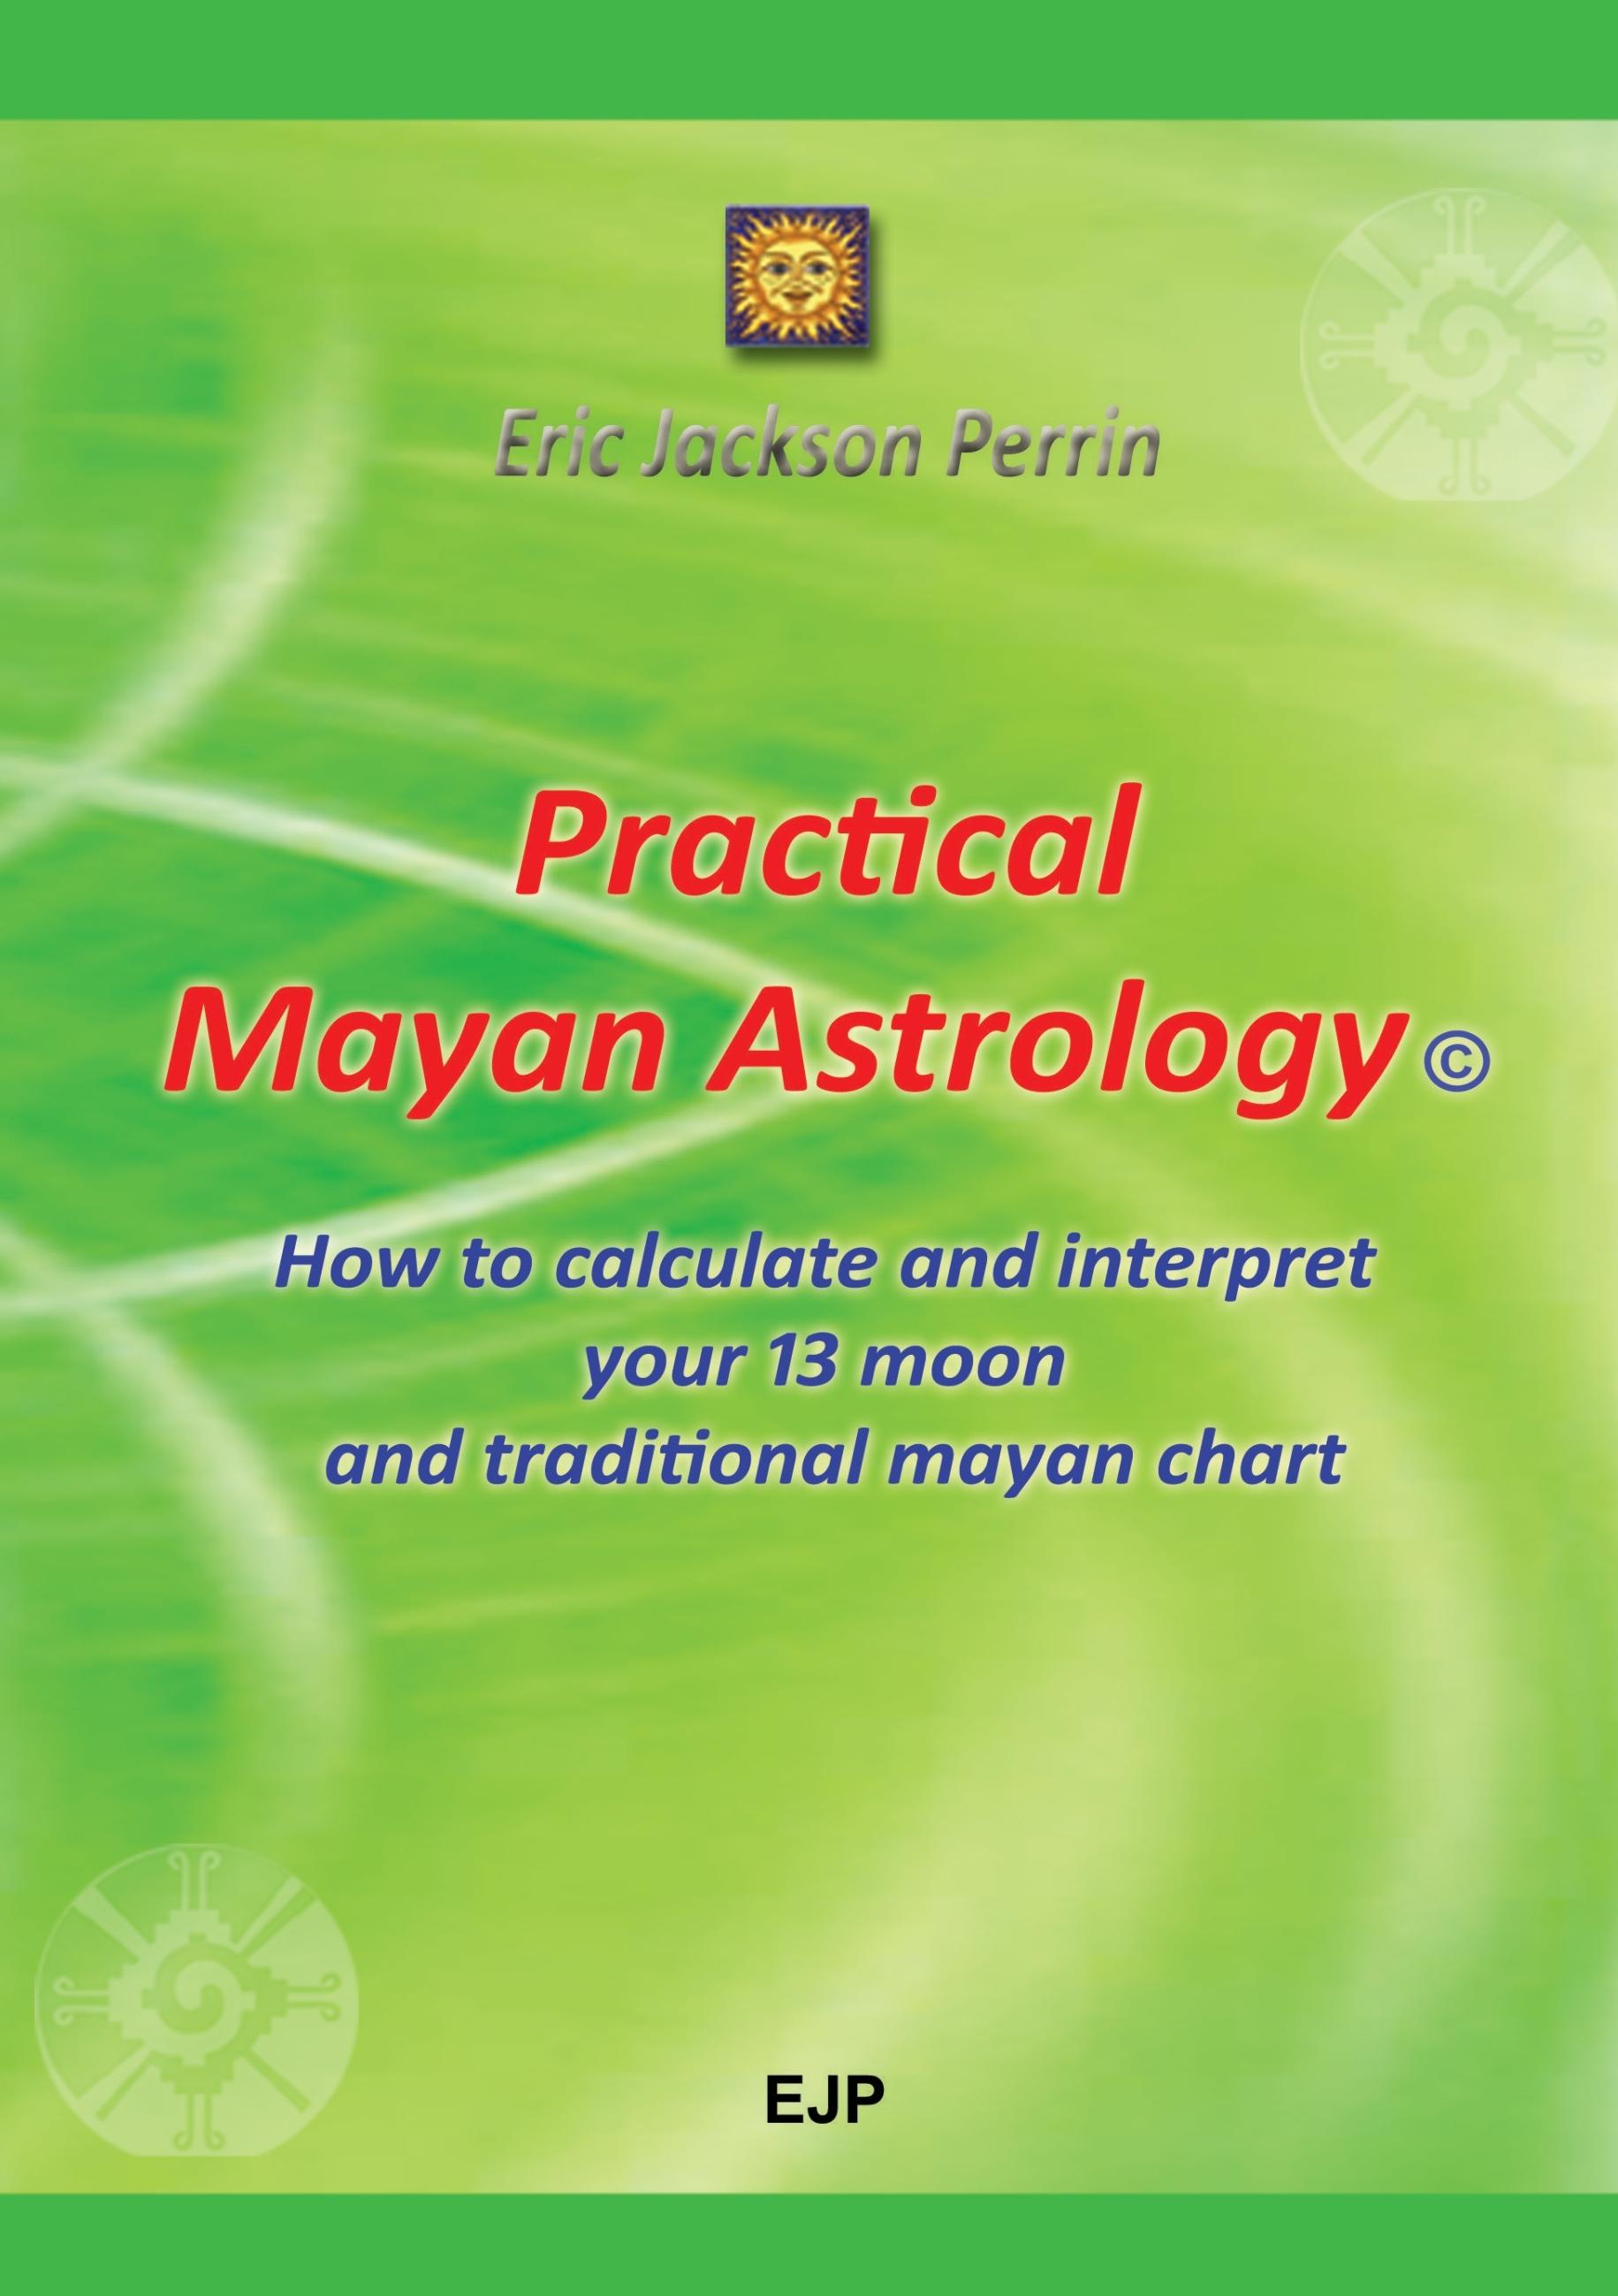 PRACTICAL MAYAN ASTROLOGY